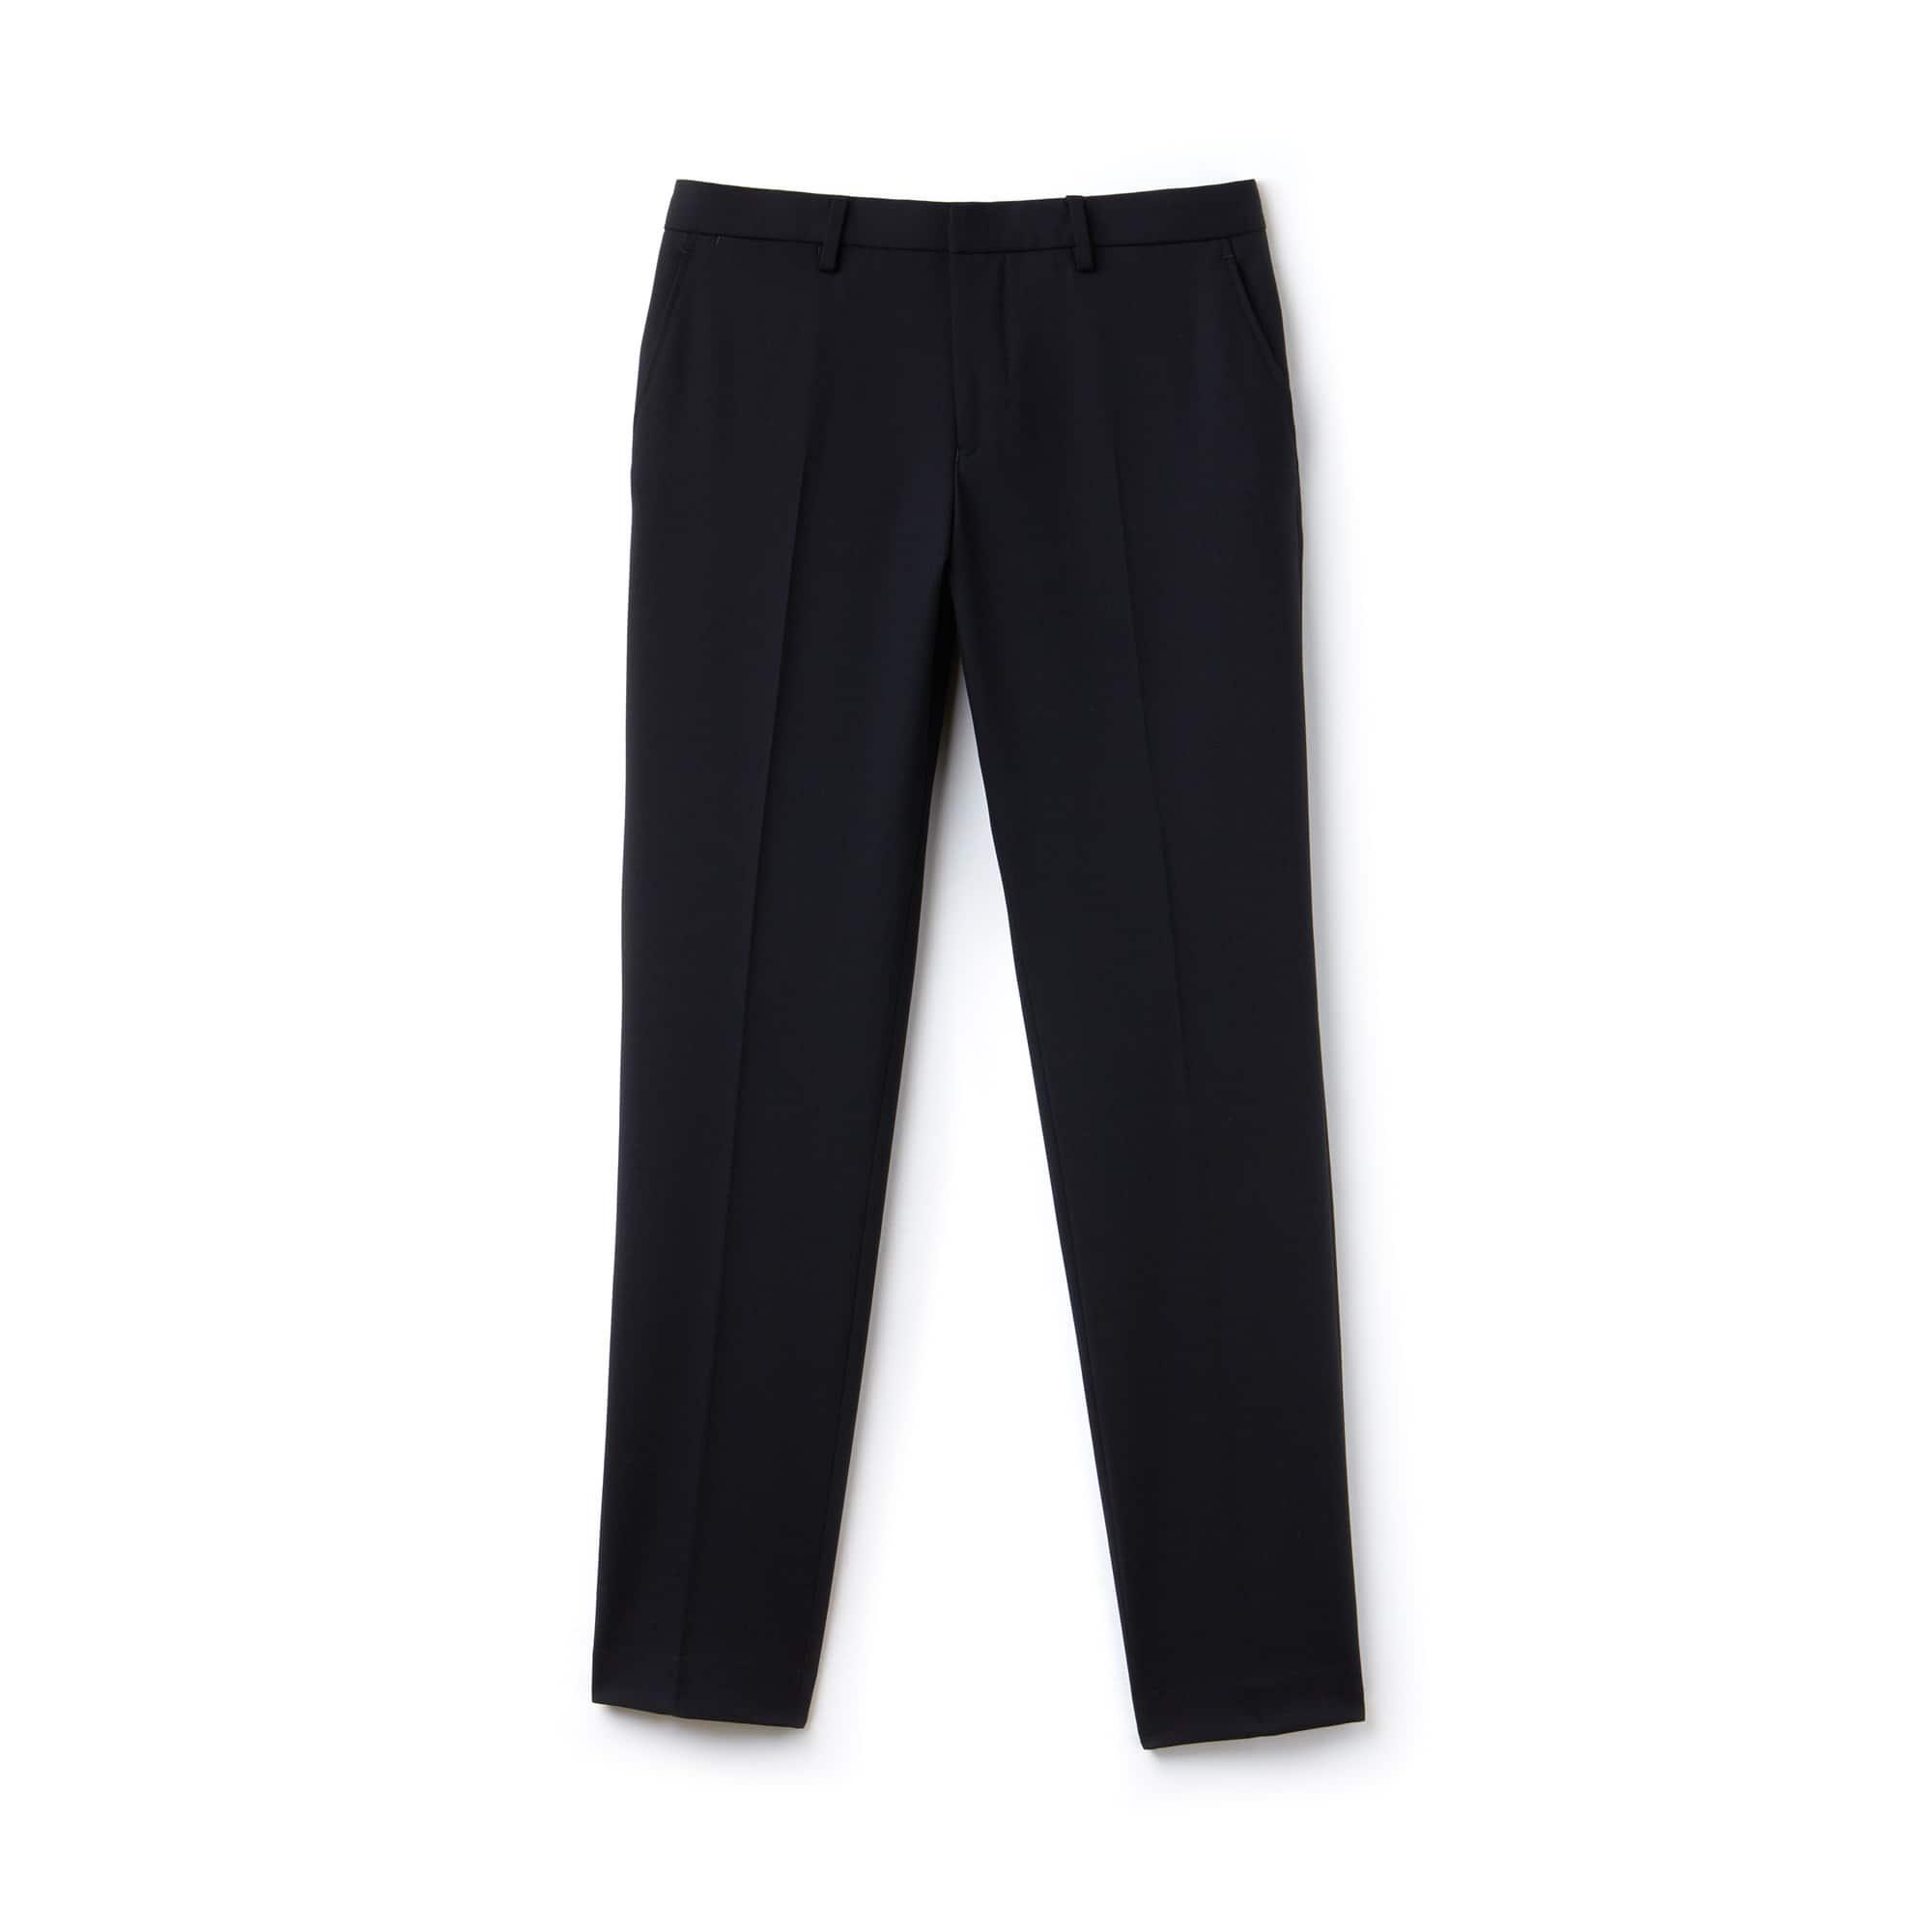 Pantalon chino slim fit en twill stretch uni